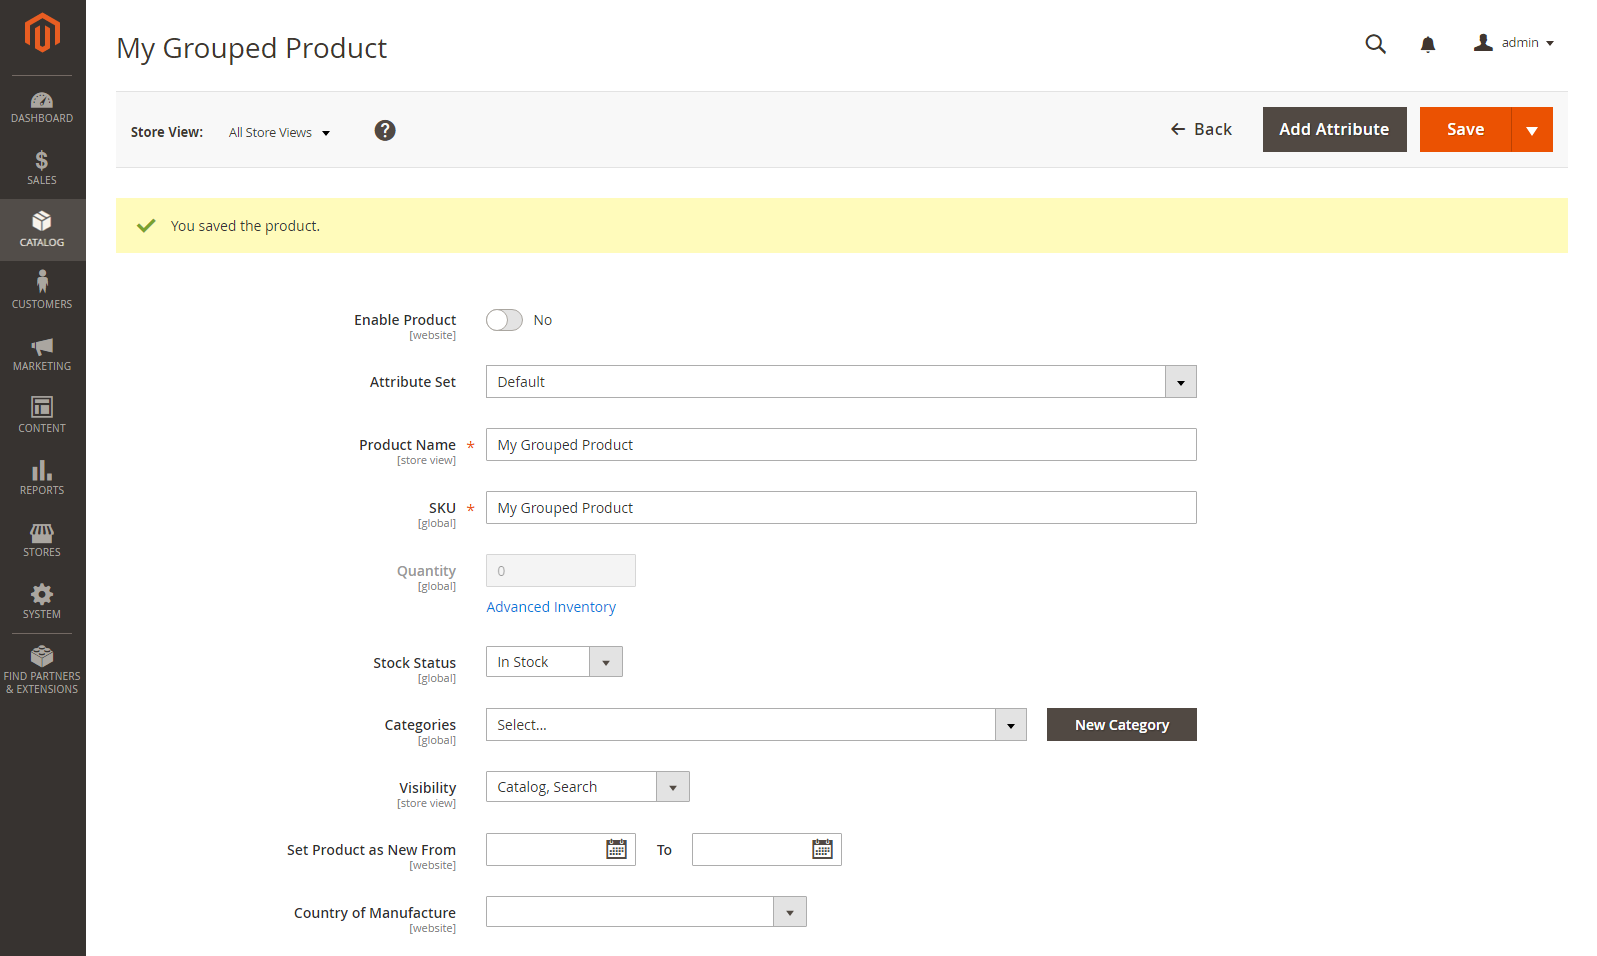 إنشاء منتج مجمع Grouped Product فى ماجنتو 2